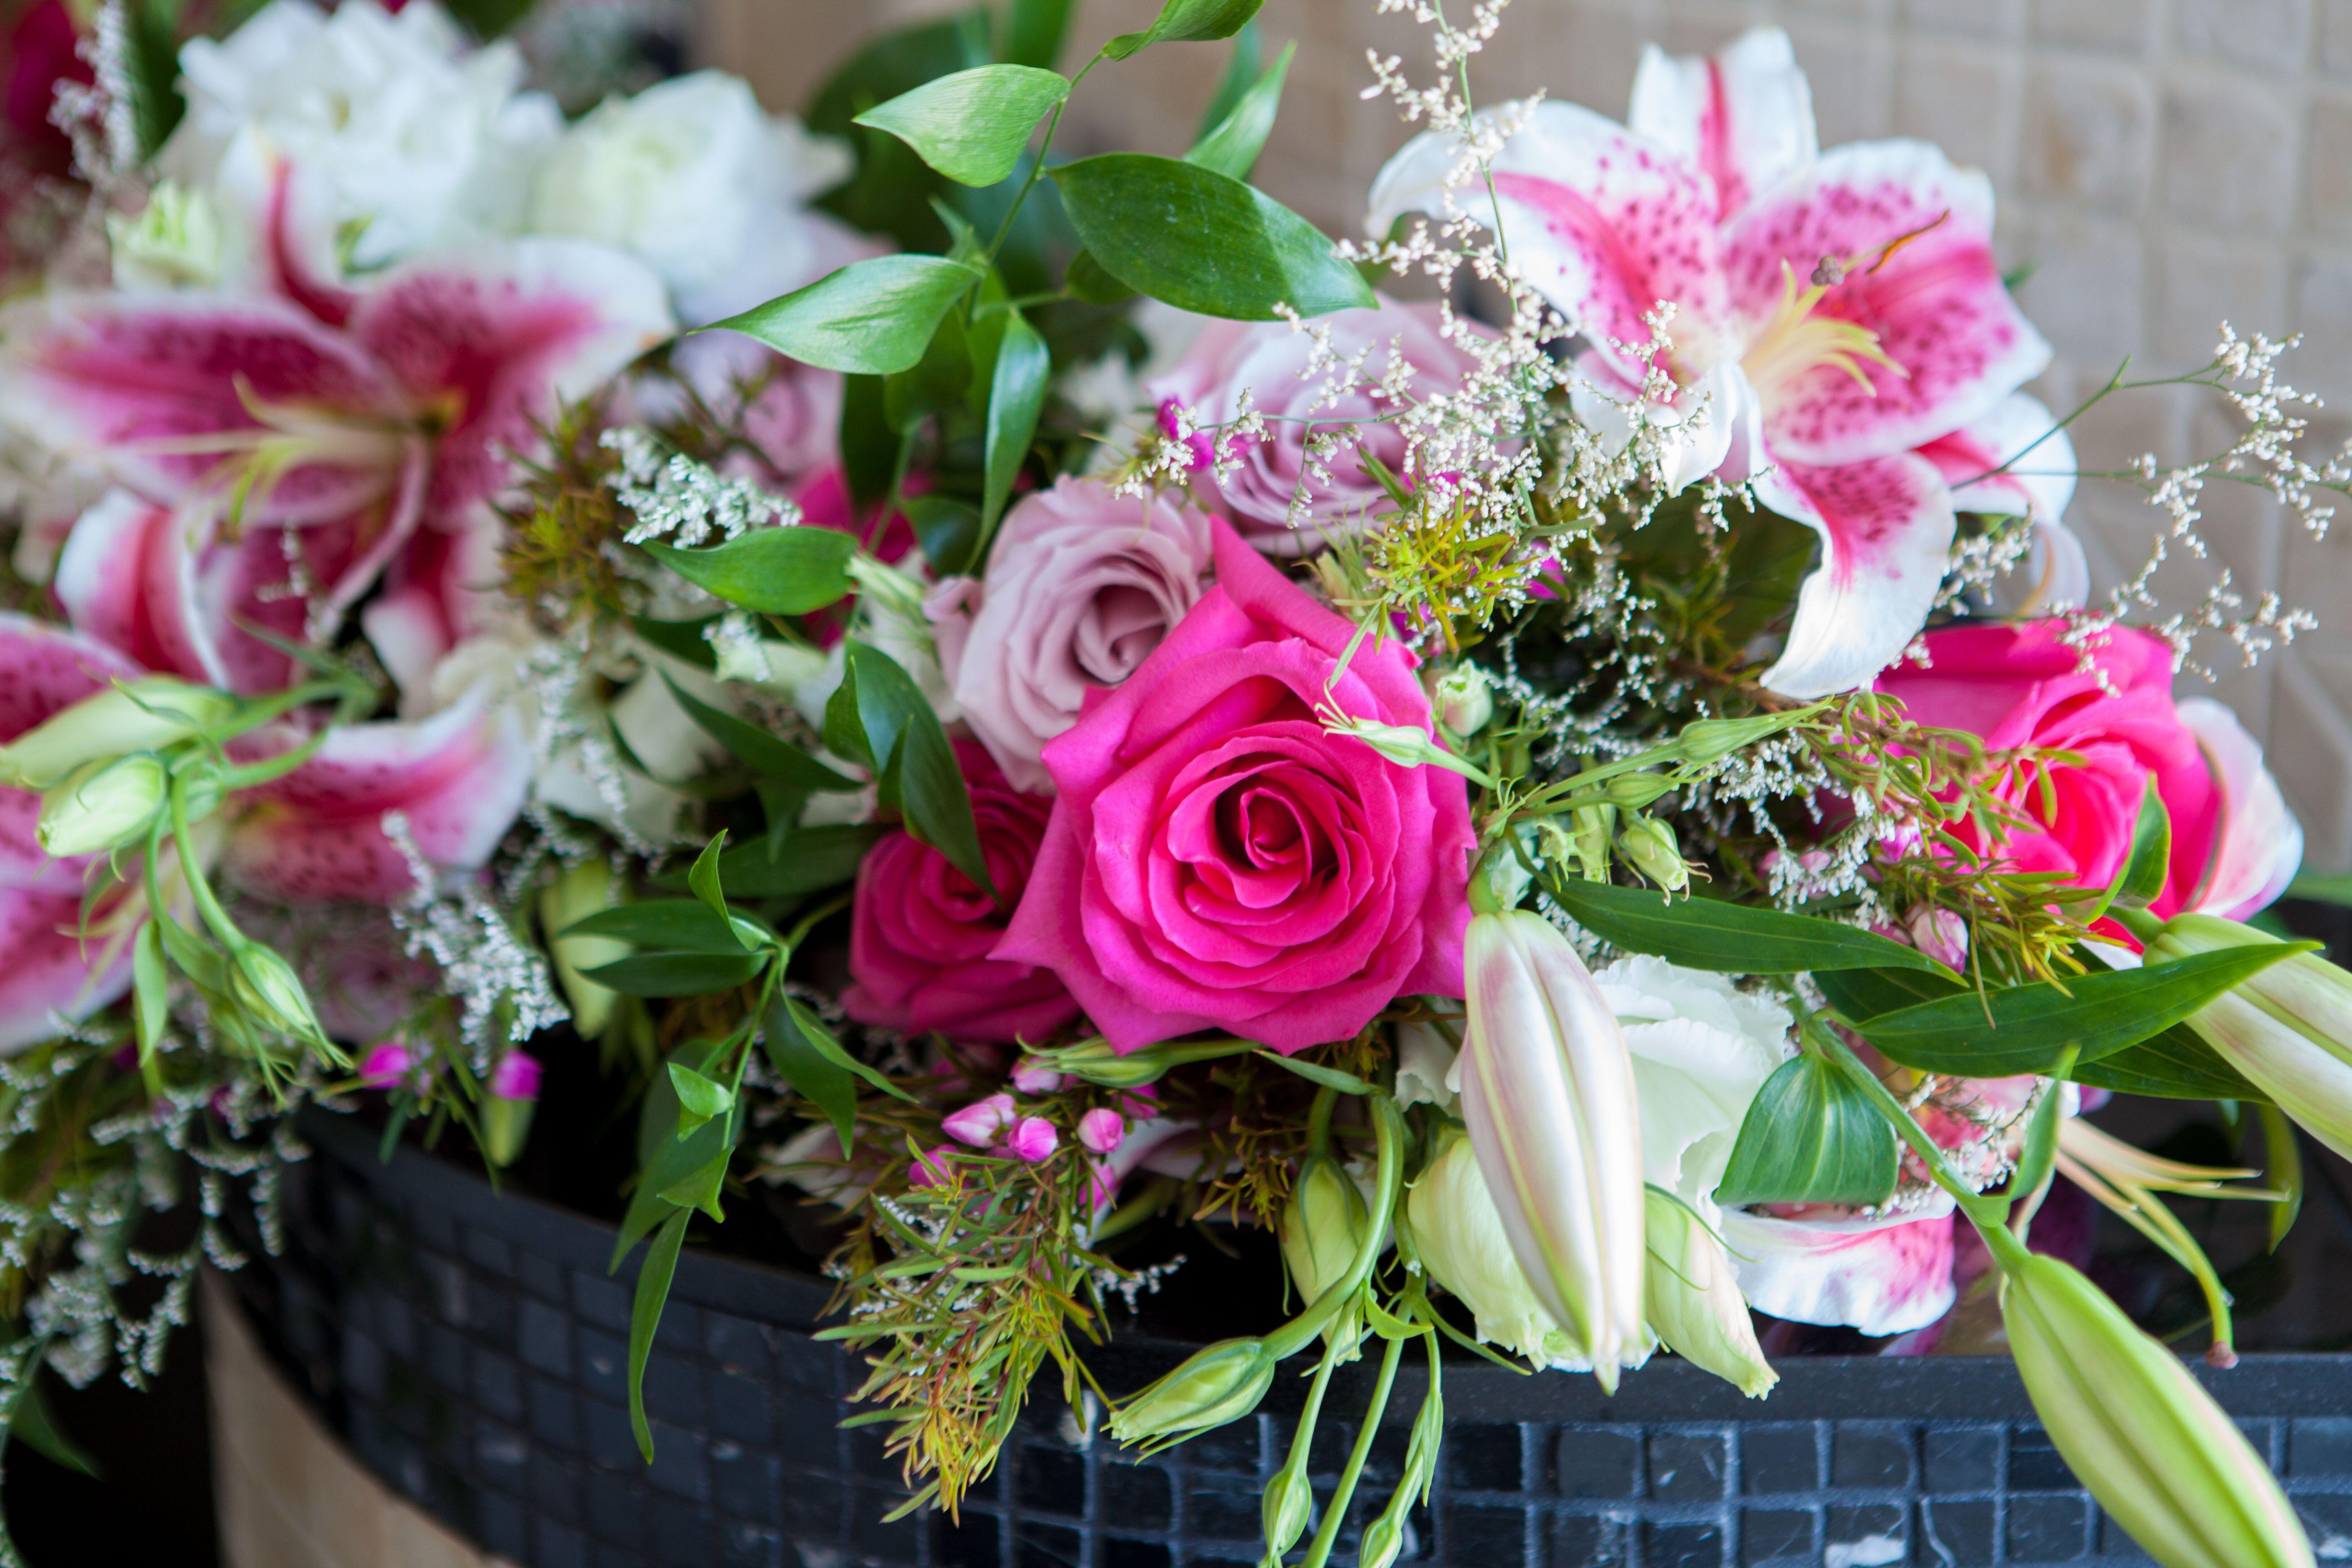 Yacht wedding decorations  Floral Flowers Pedestals Decor Florist Decorations CYNB